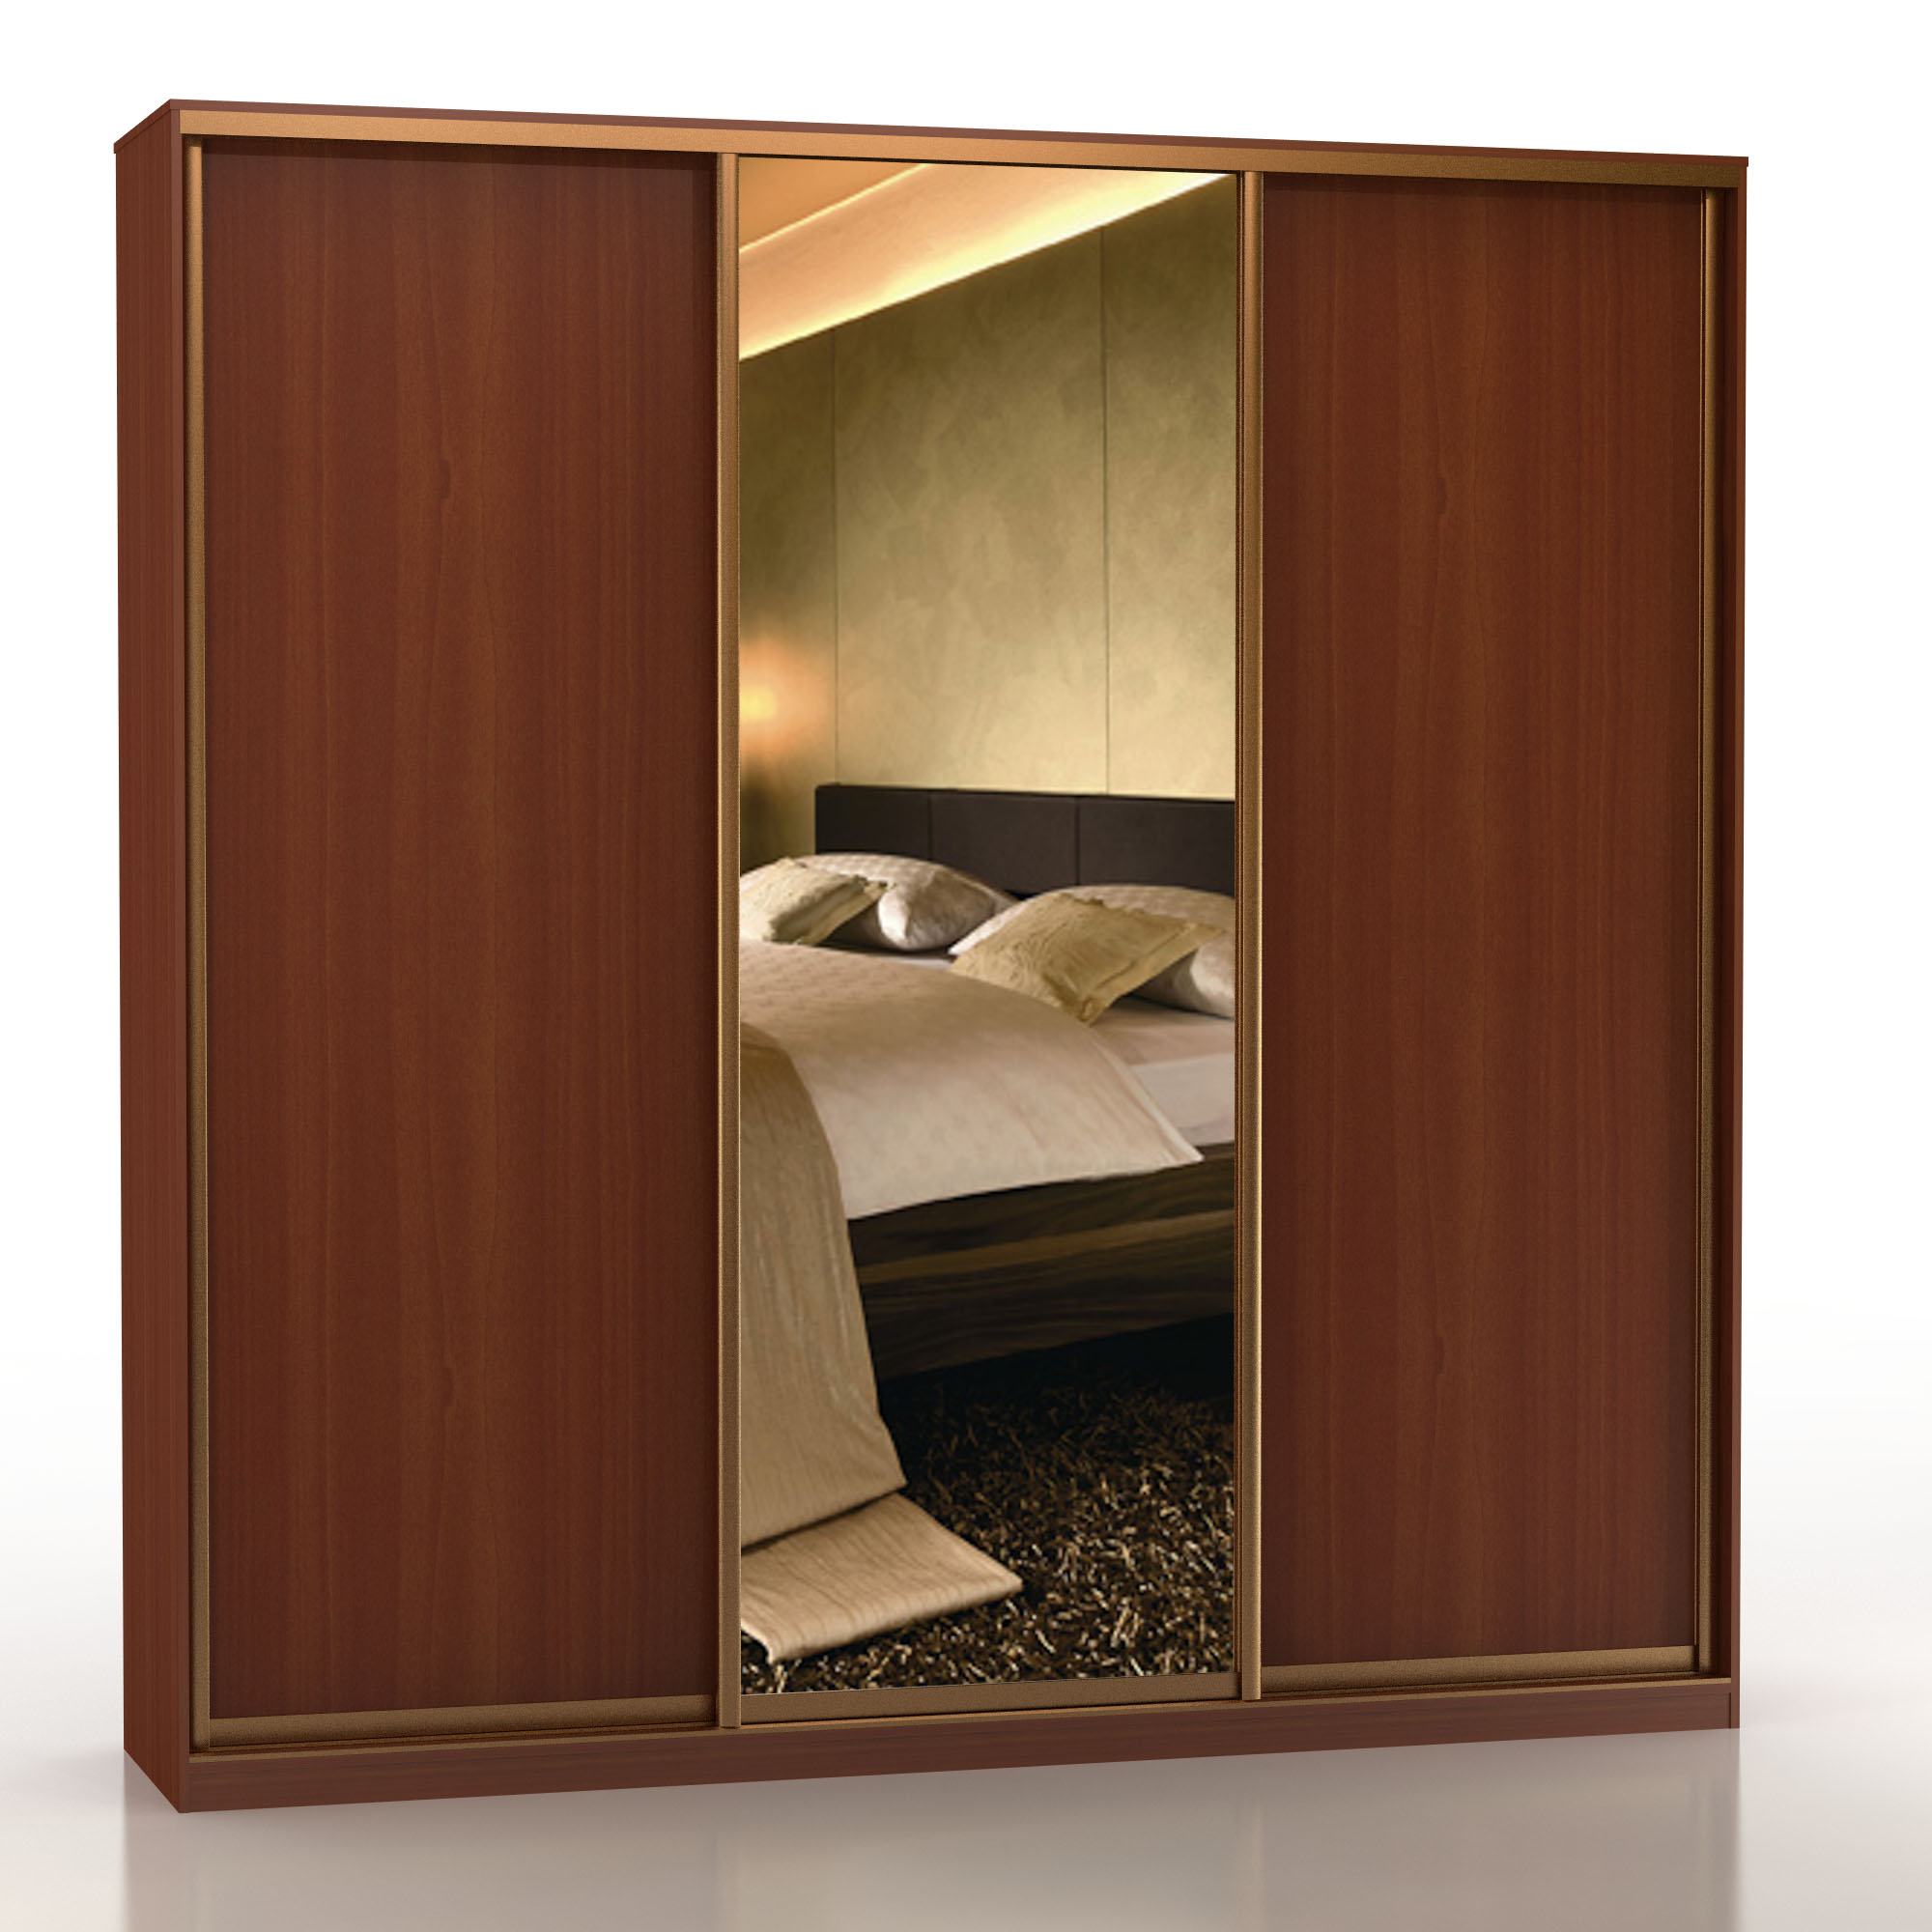 Купить шкаф-купе шк-3 без зеркал - 832921490.